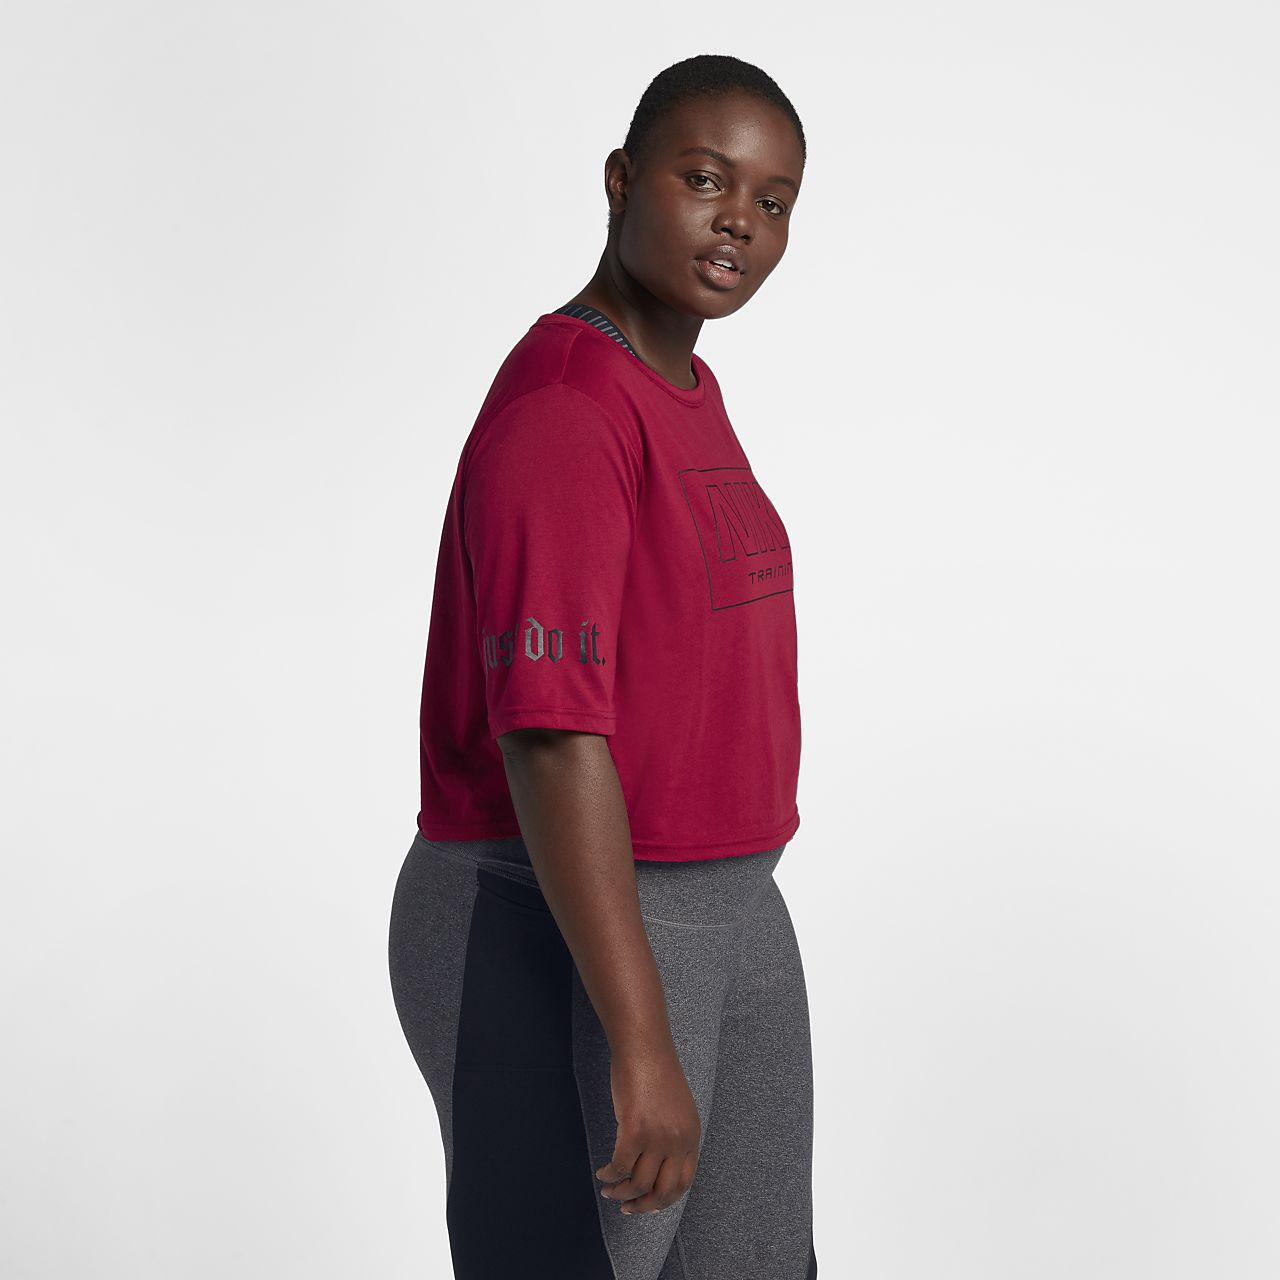 b276187fa5d0 Γυναικεία κοντομάνικη μπλούζα προπόνησης Nike (μεγάλα μεγέθη). Nike ...